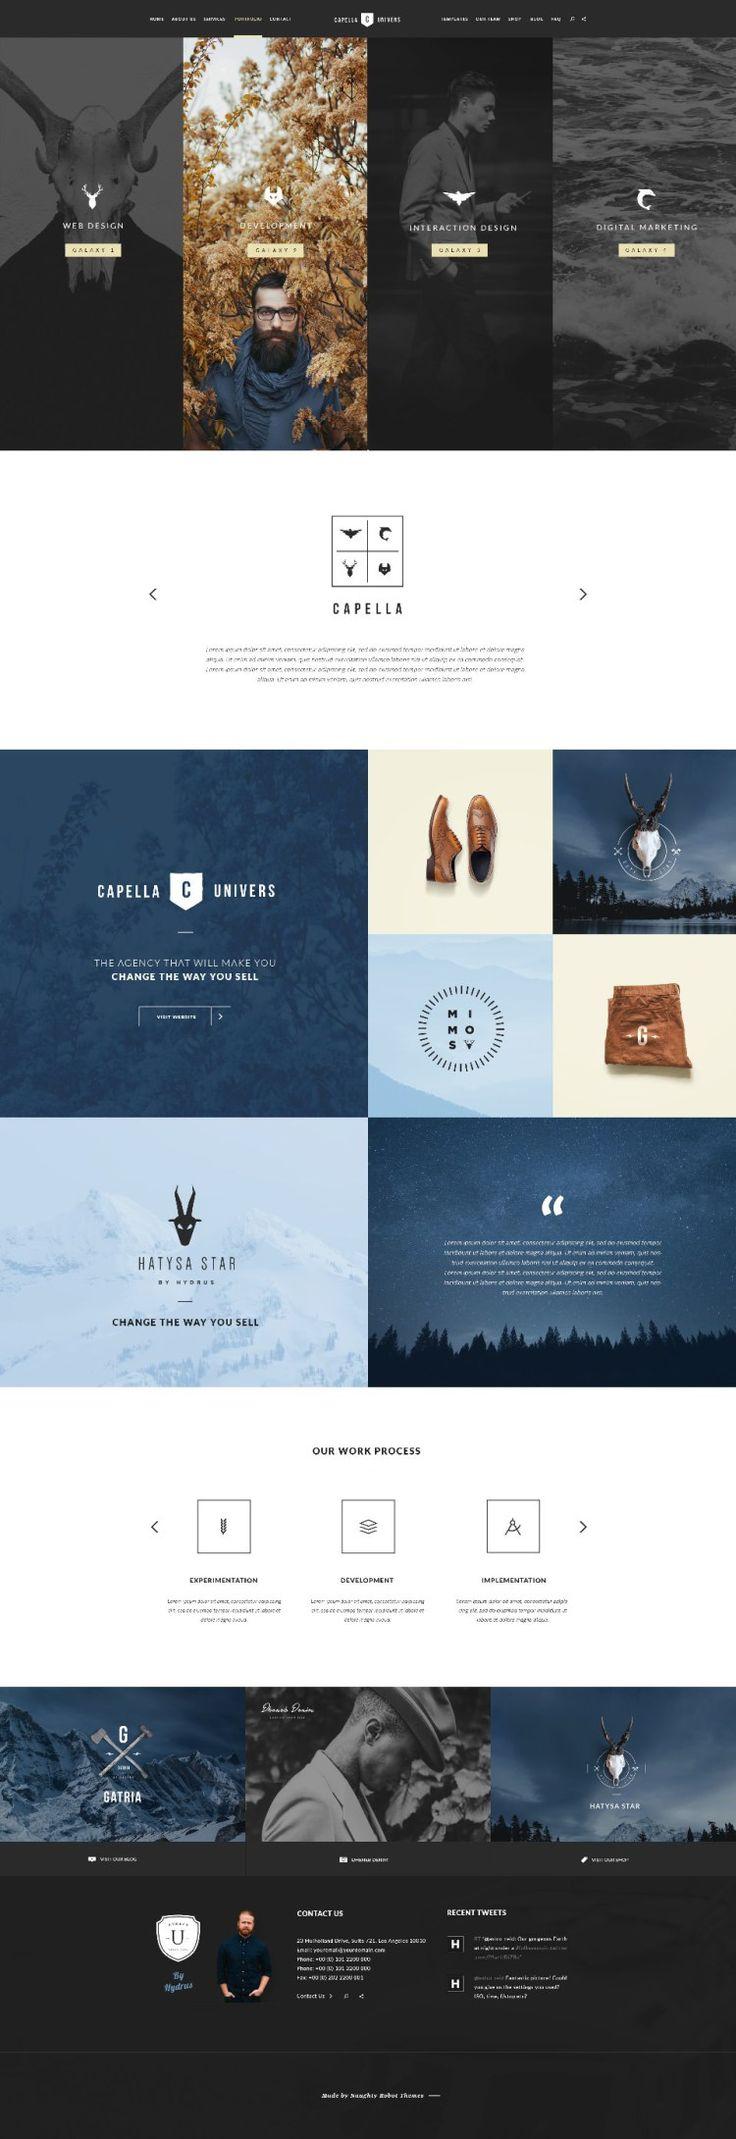 Hydrus Web Design Inspiration by naughtyrobot                                                                                                                                                                                 More